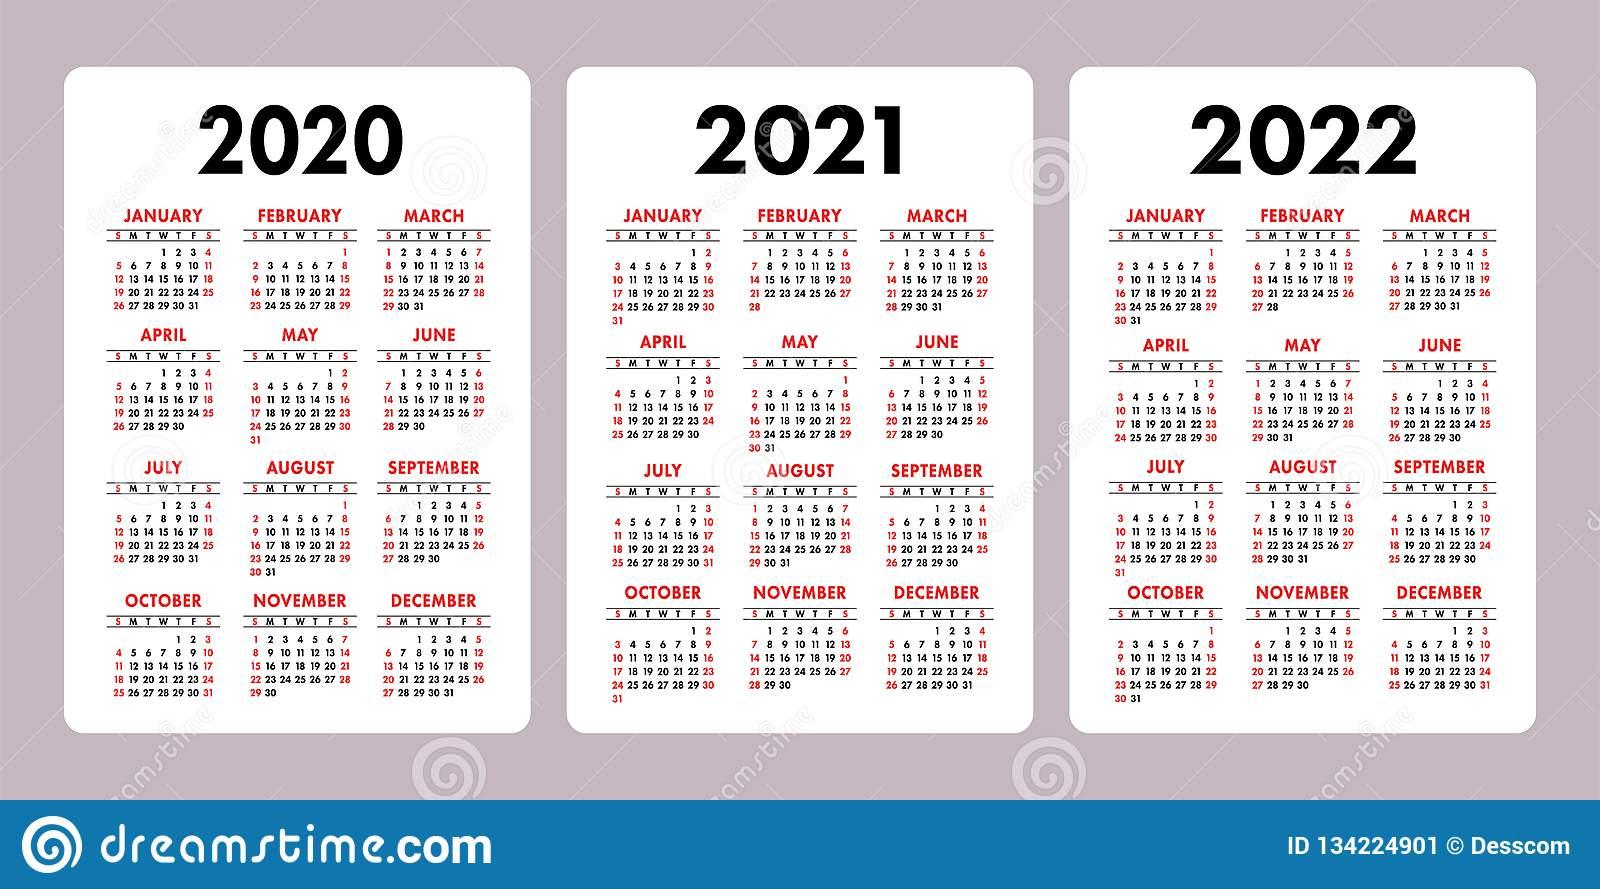 Calendar 2020 2021 2022 Years Vertical Vector Calender